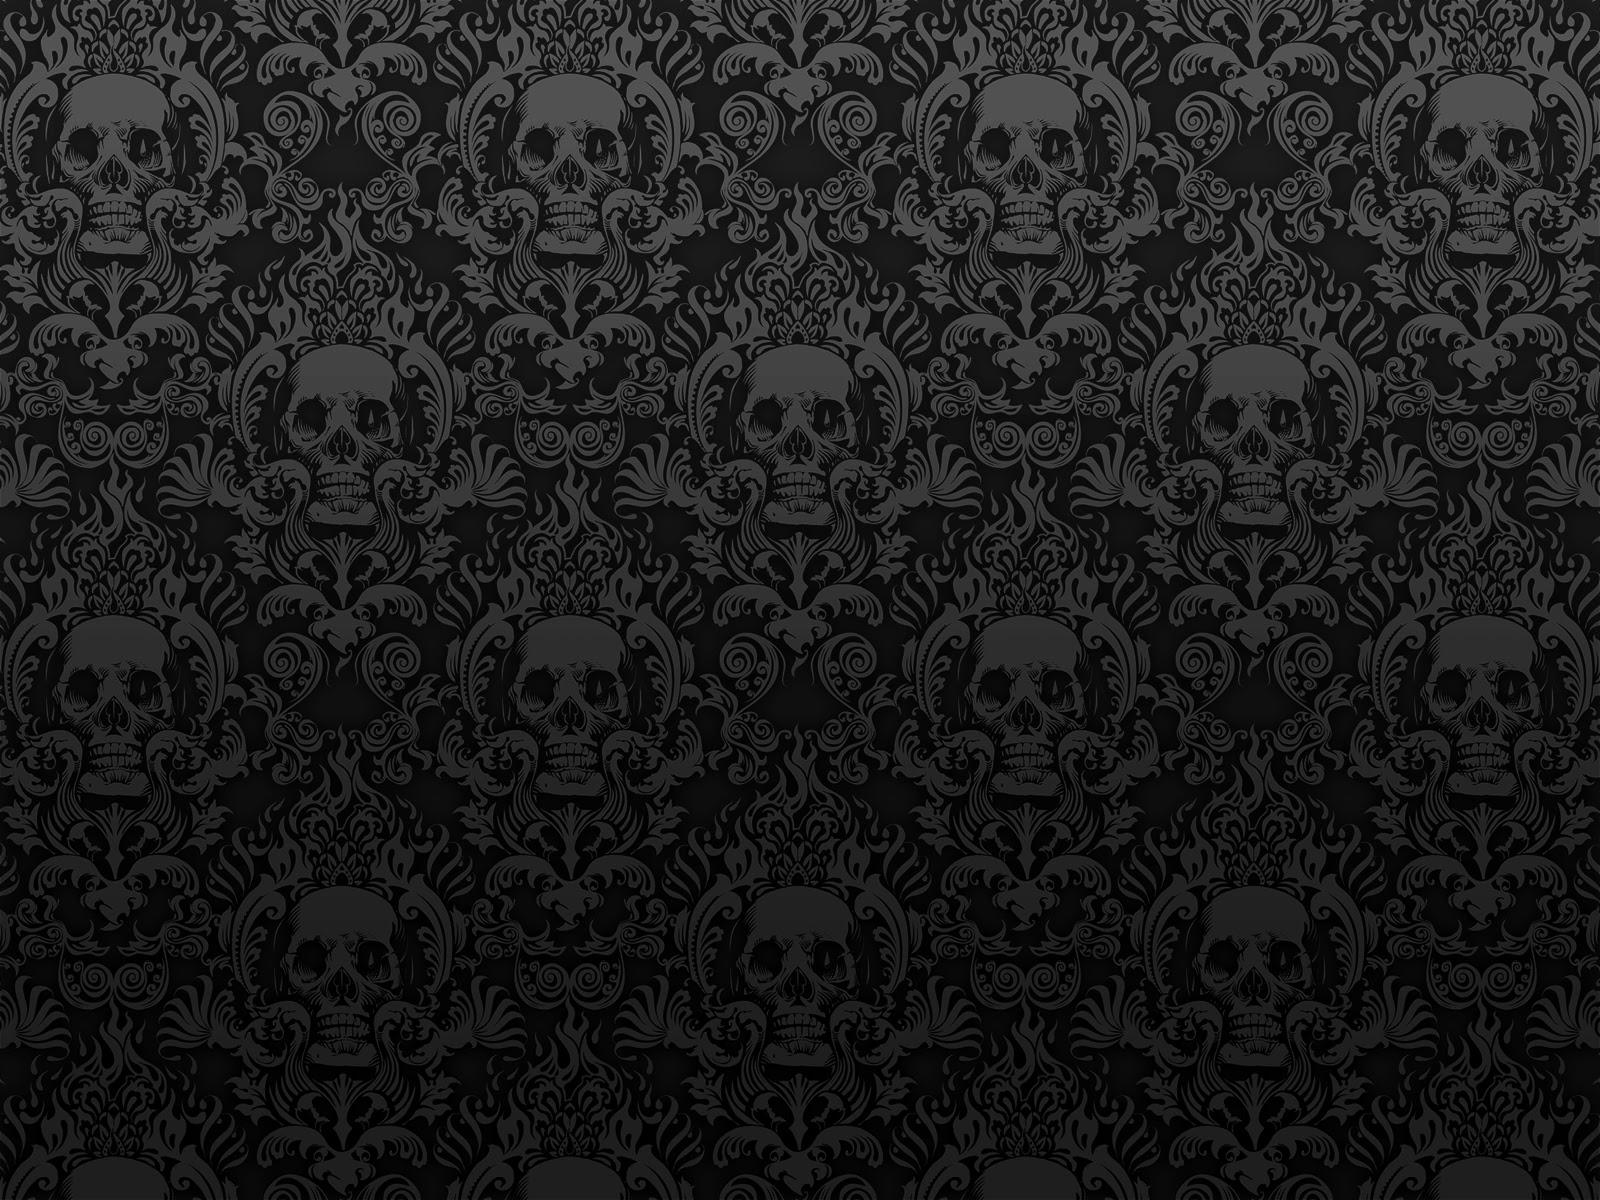 Black And White Damask Wallpaper 11 Widescreen Wallpaper  Hdblackwallpaper.com